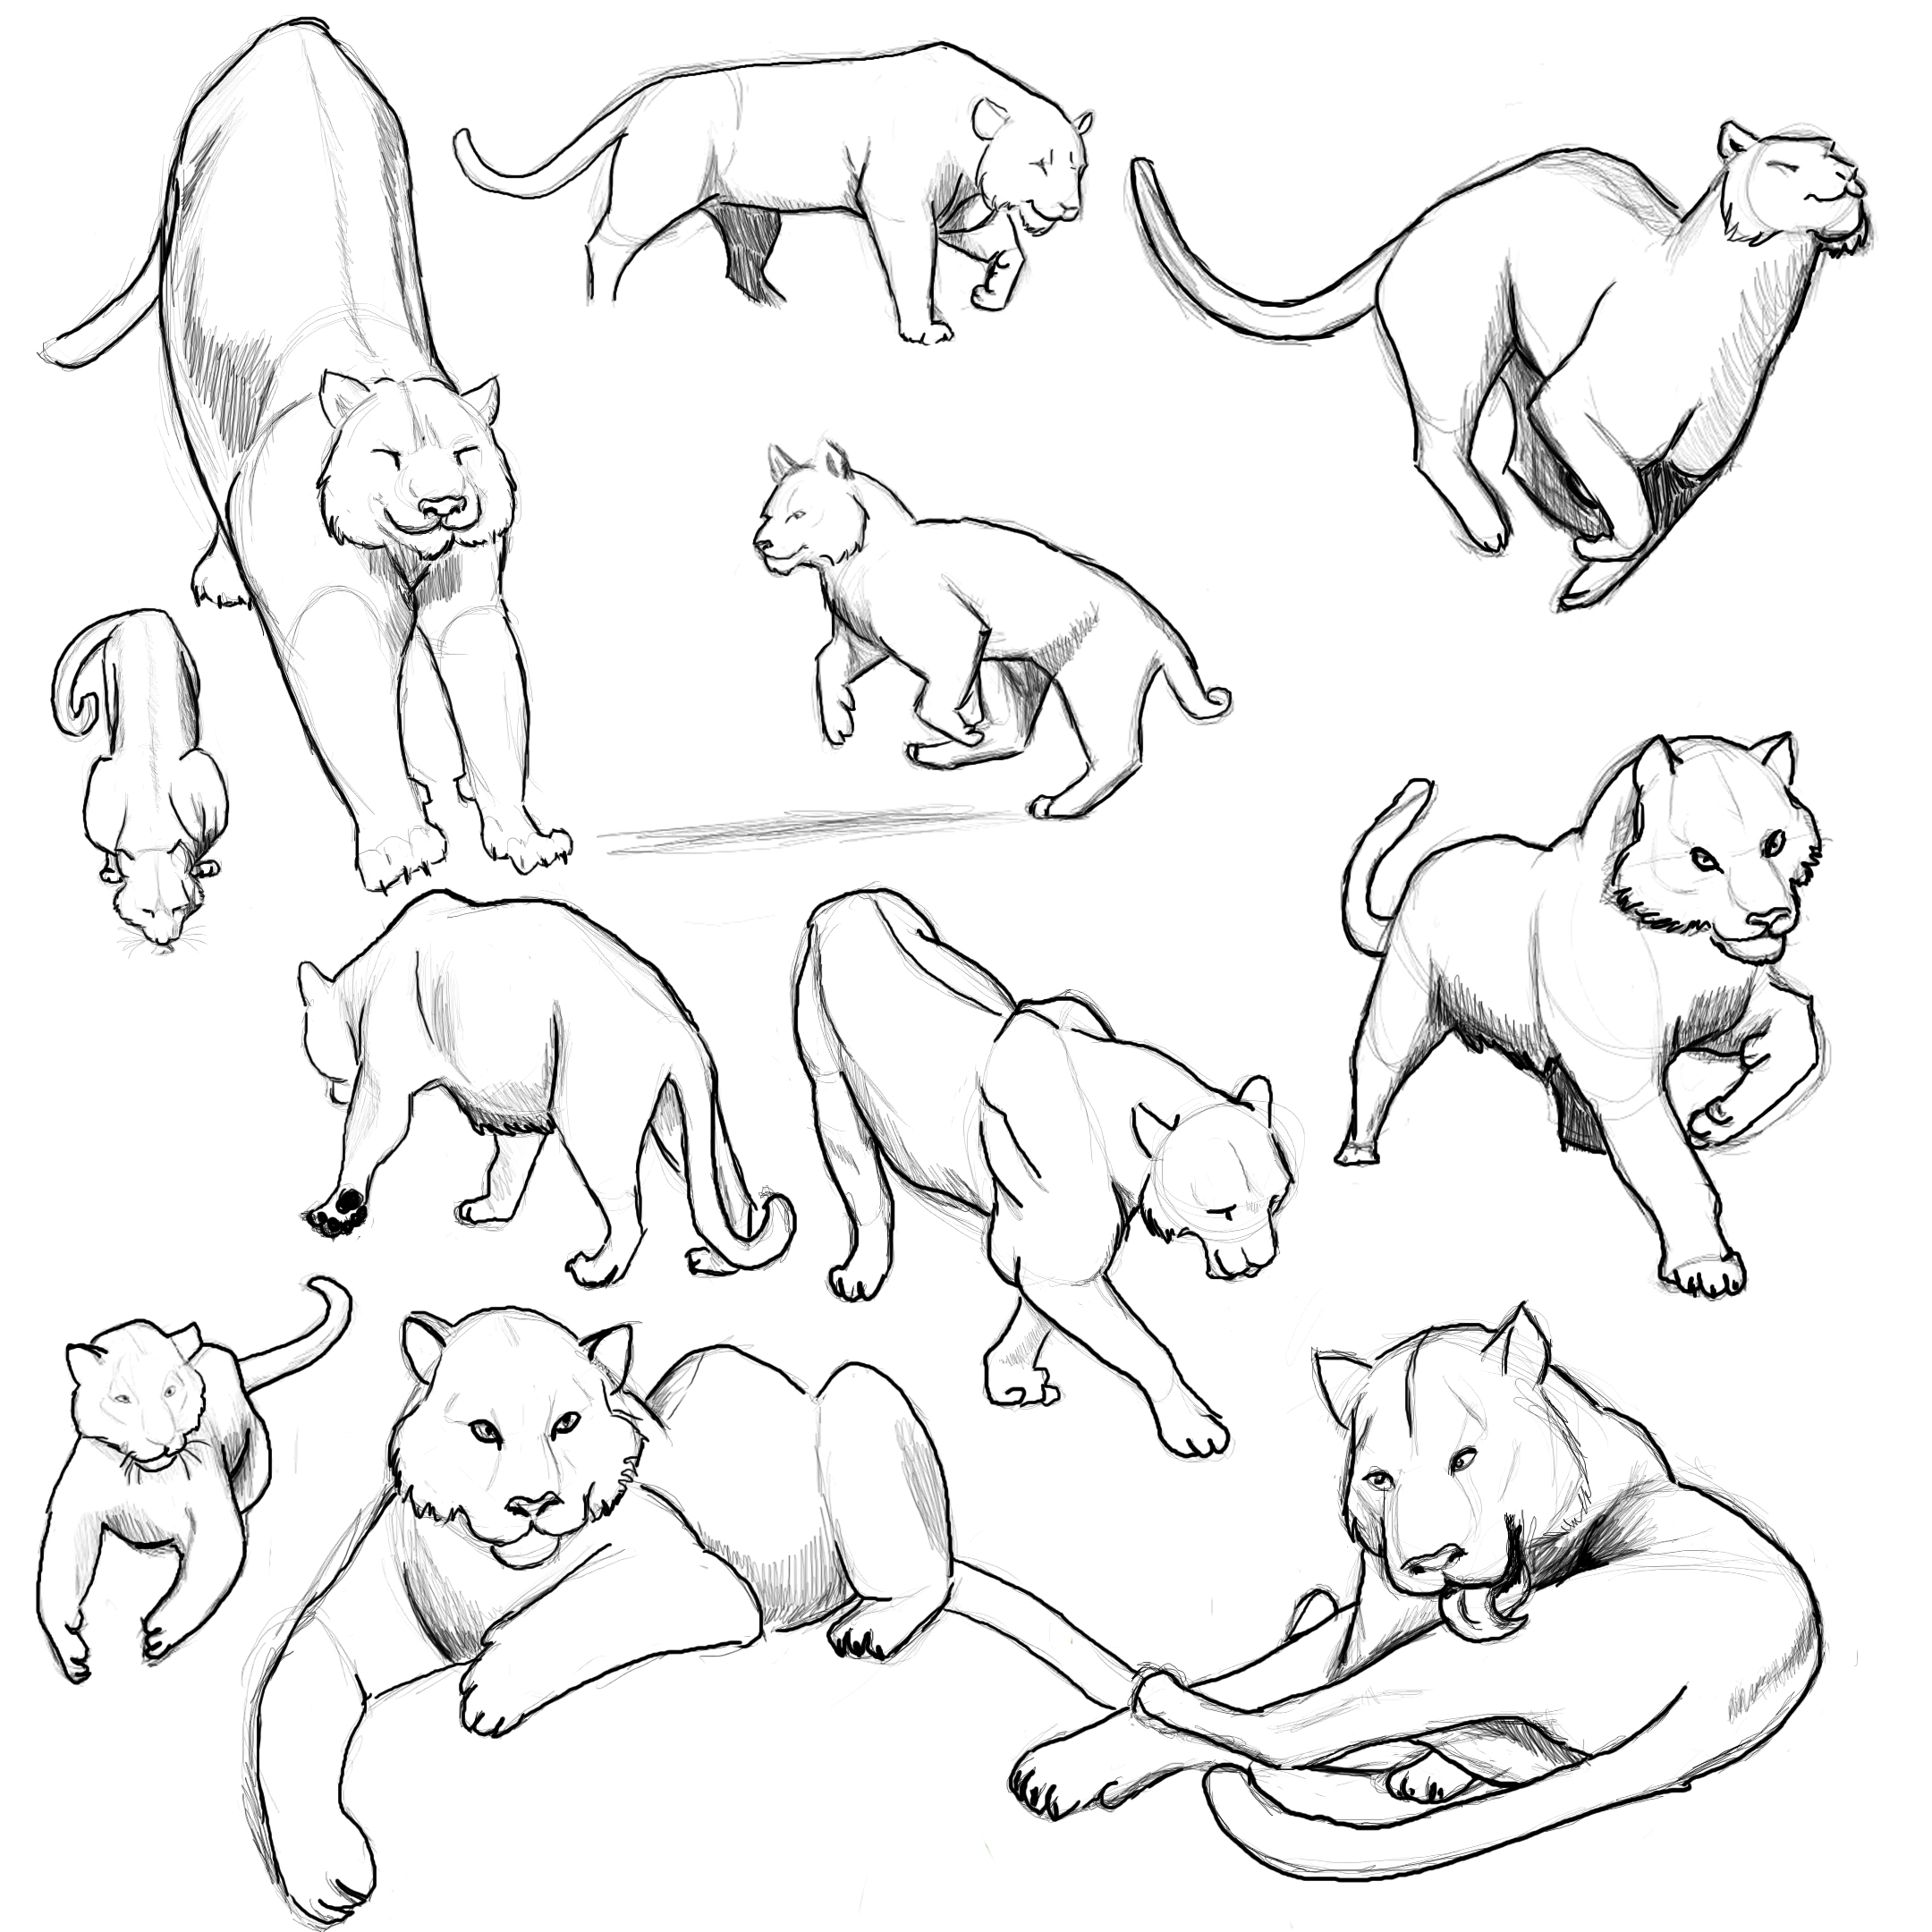 Tiger Poses: Study 1